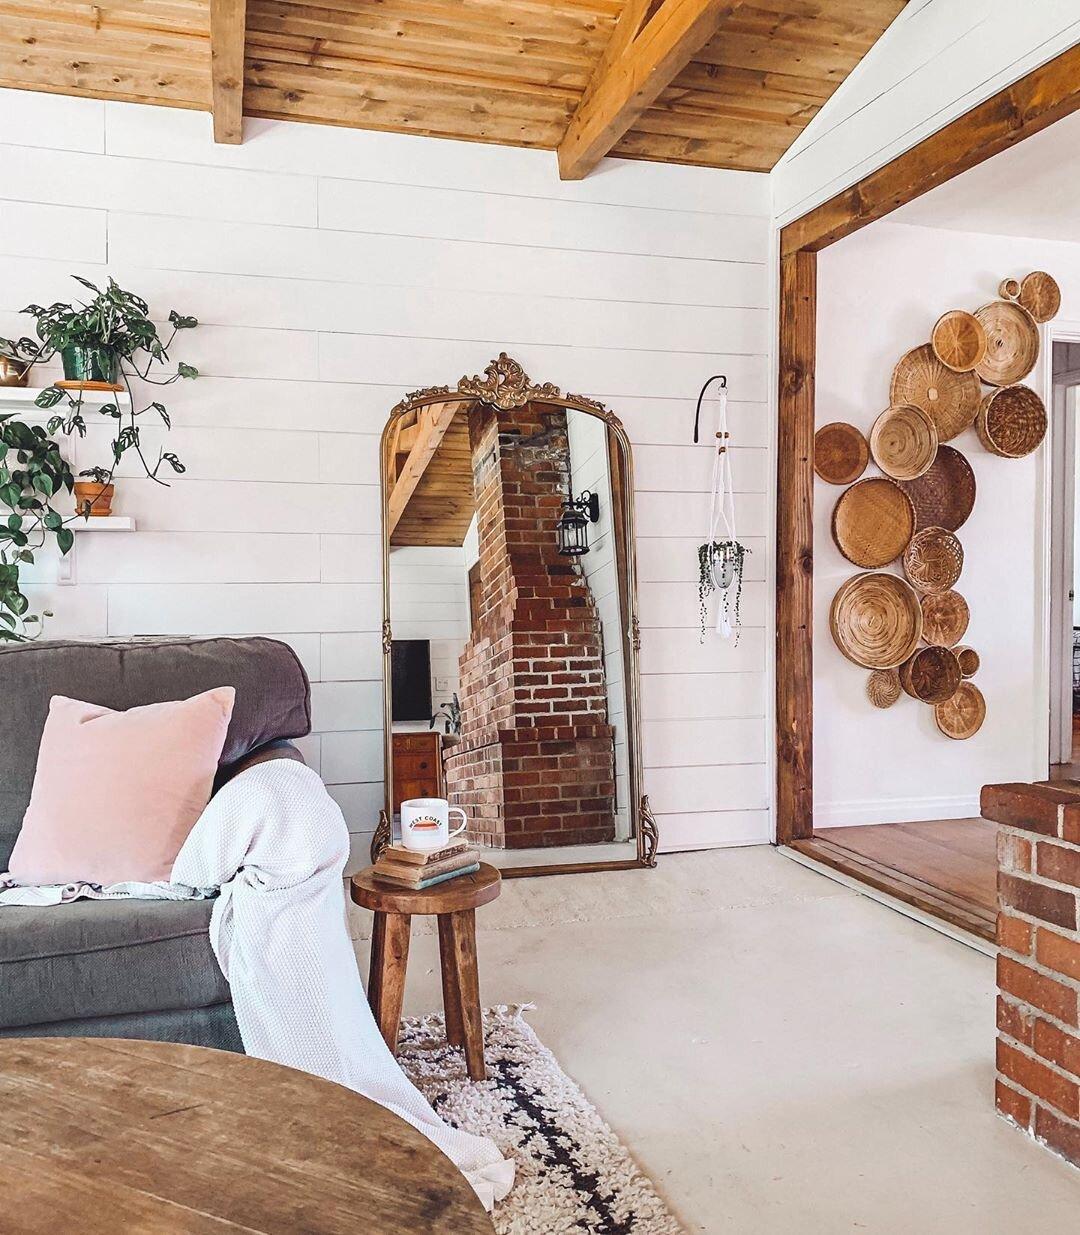 Basket Wall - Boho - RusticPallete